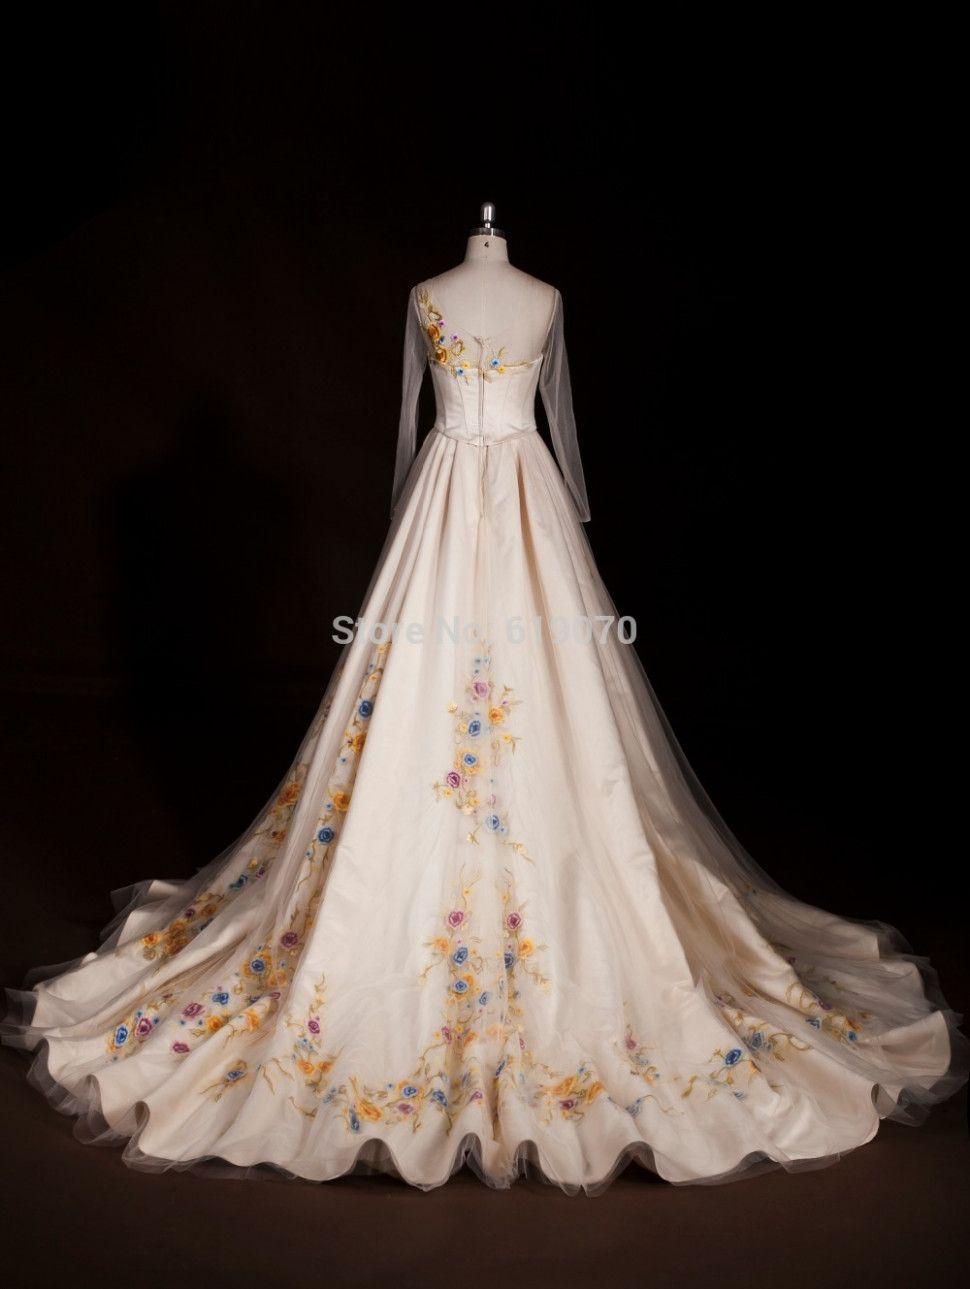 high end cinderella wedding dress fairy tale dream bridal gown 2015 classic  movies brides  WeddingGowns  CinderellaFairyTales 0547ccd031